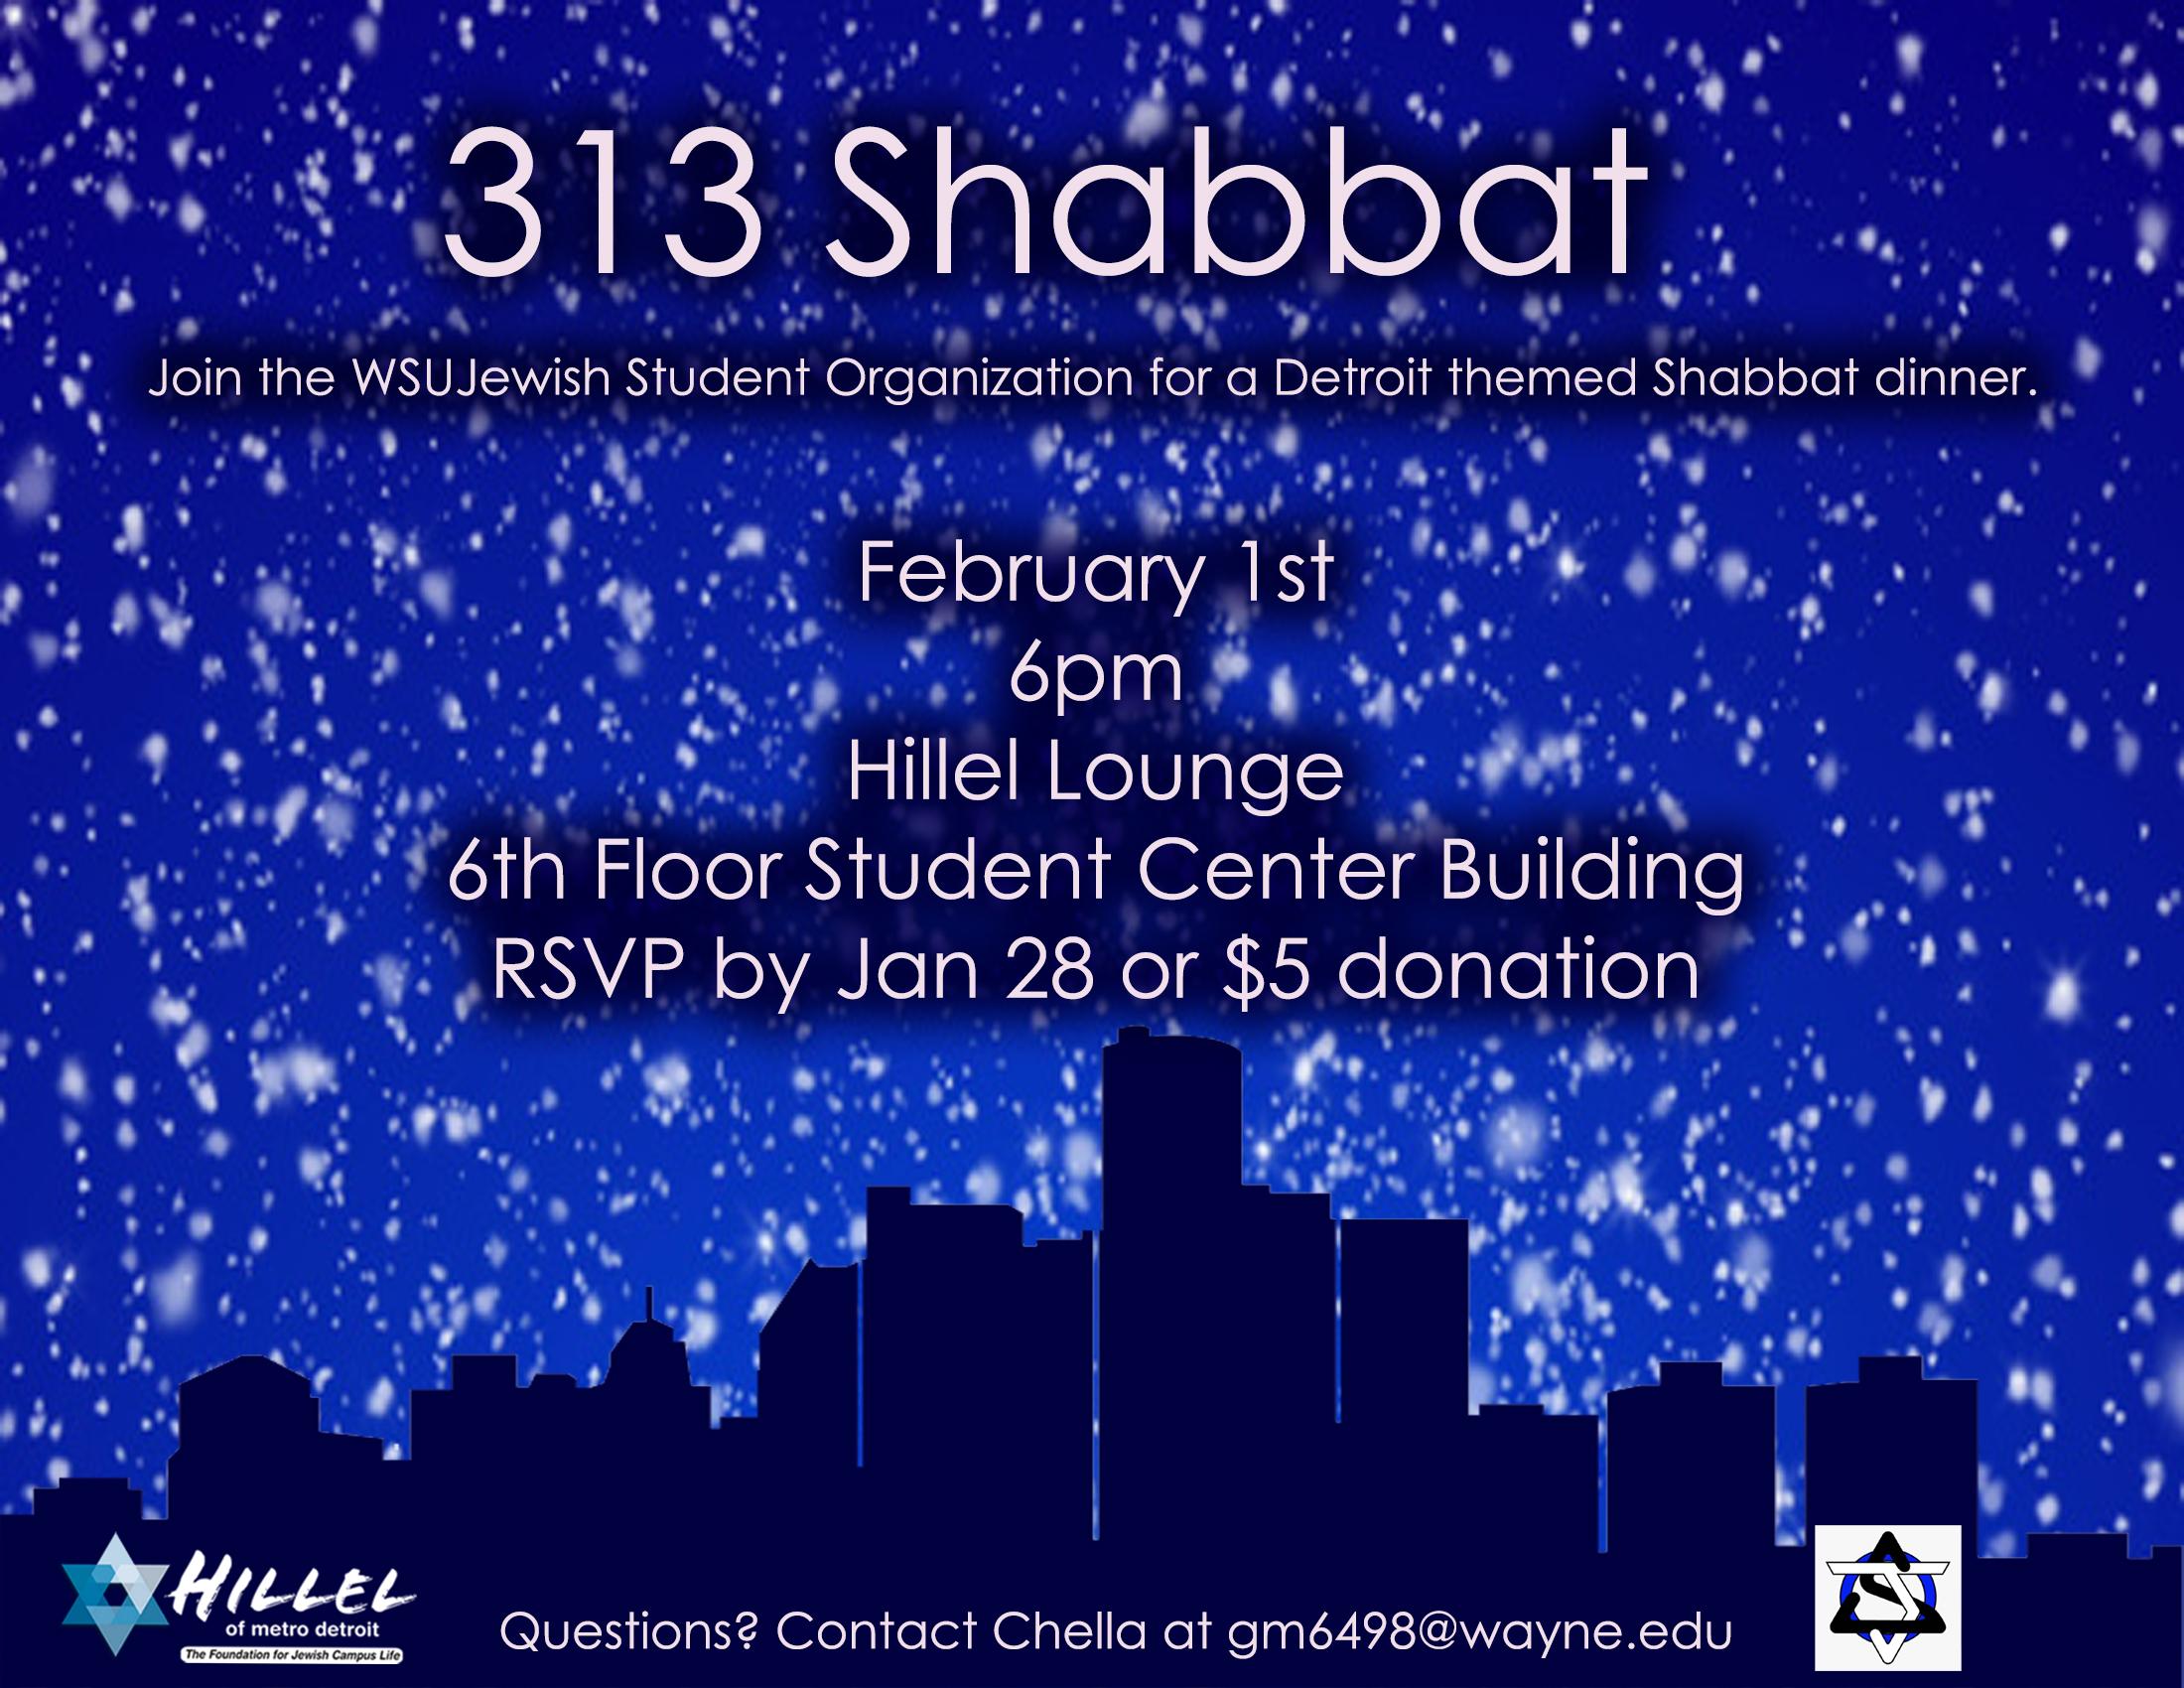 313 Shabbat